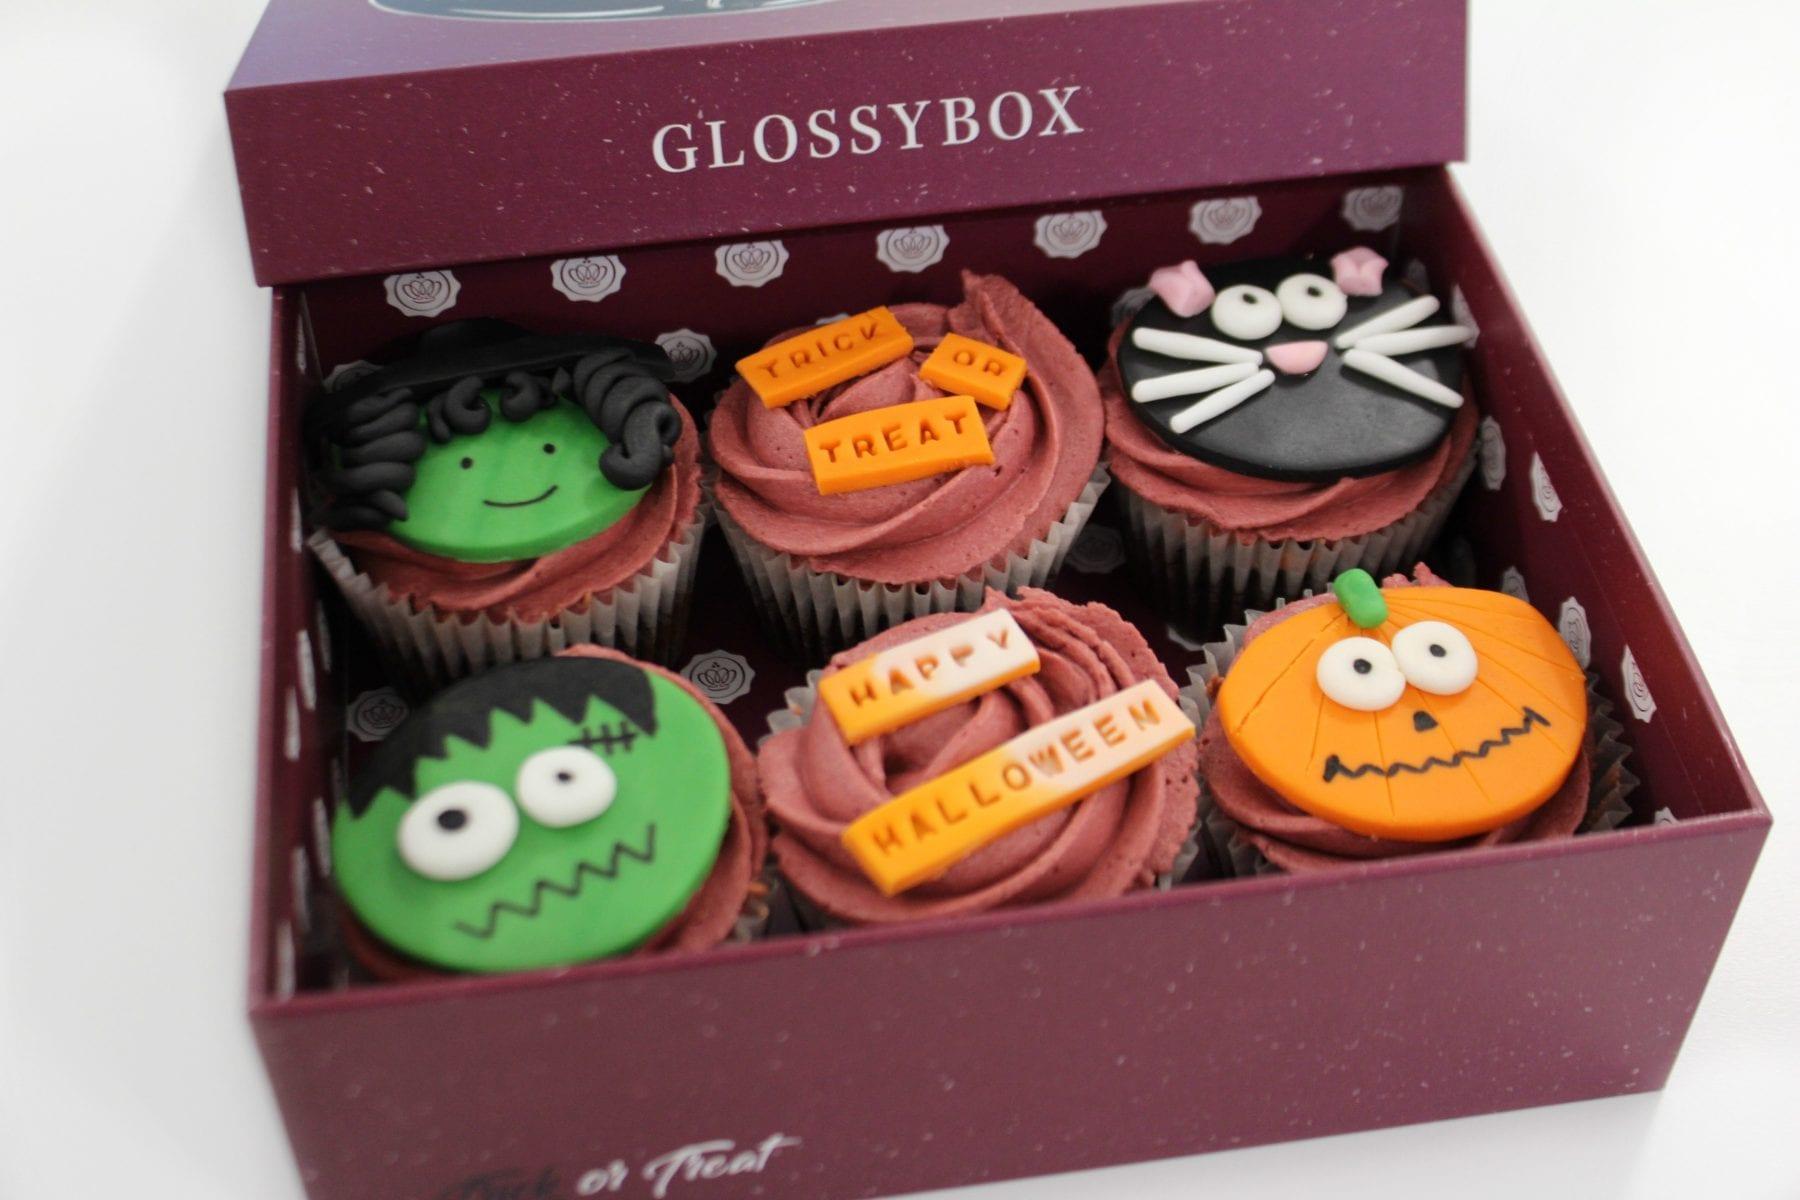 Treat Cupcakes